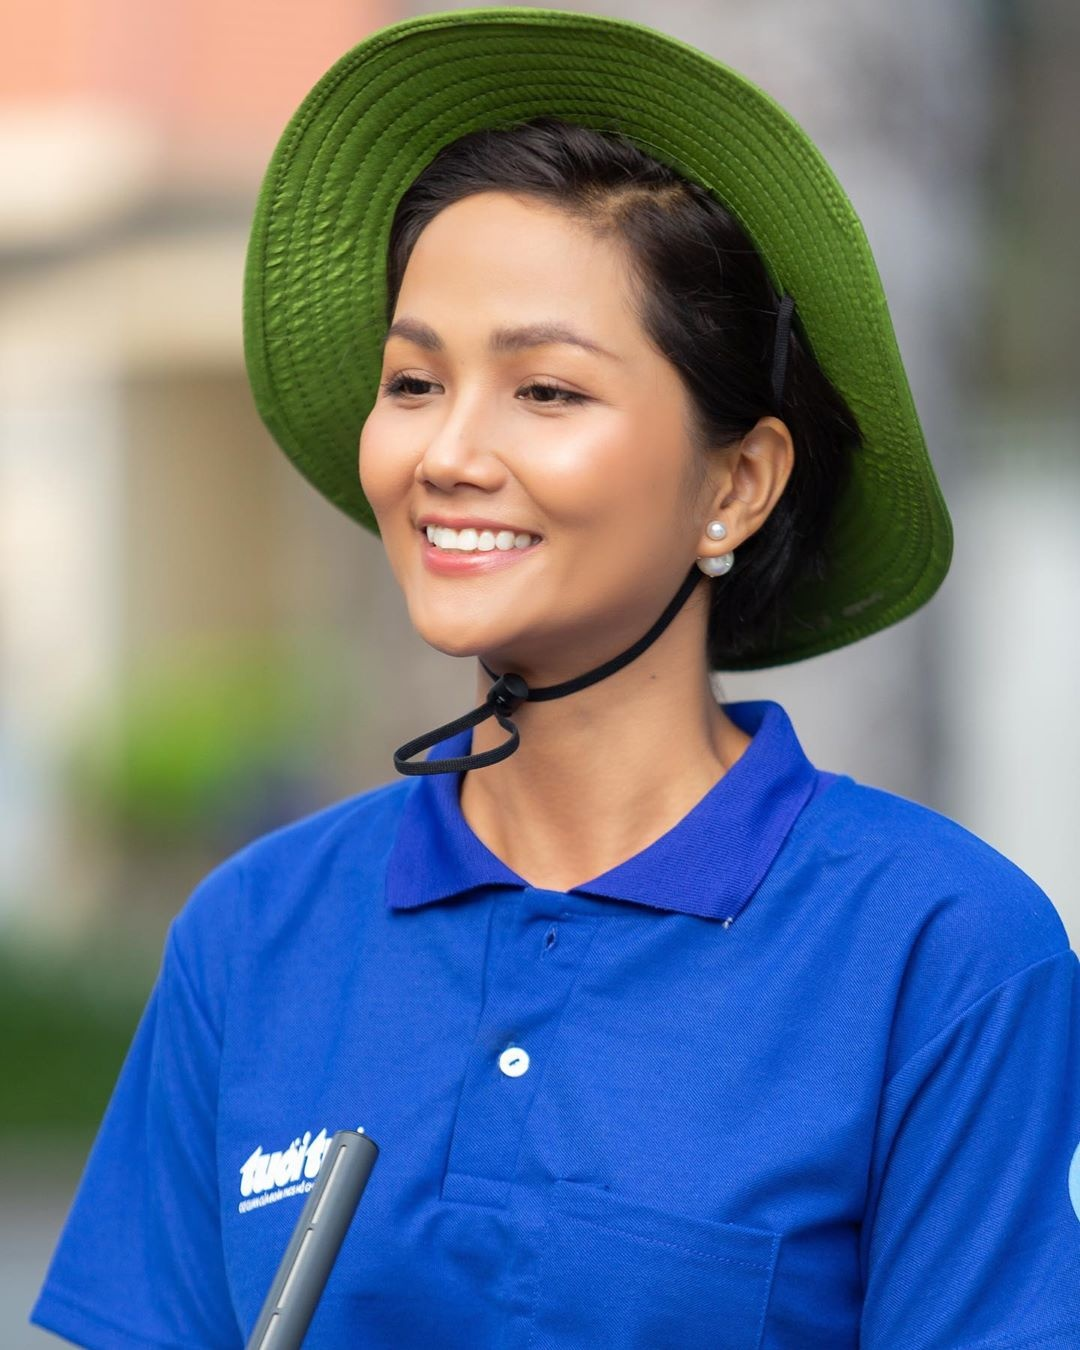 So phan khac biet cua 3 my nhan dang quang Hoa hau Hoan vu Viet Nam hinh anh 90